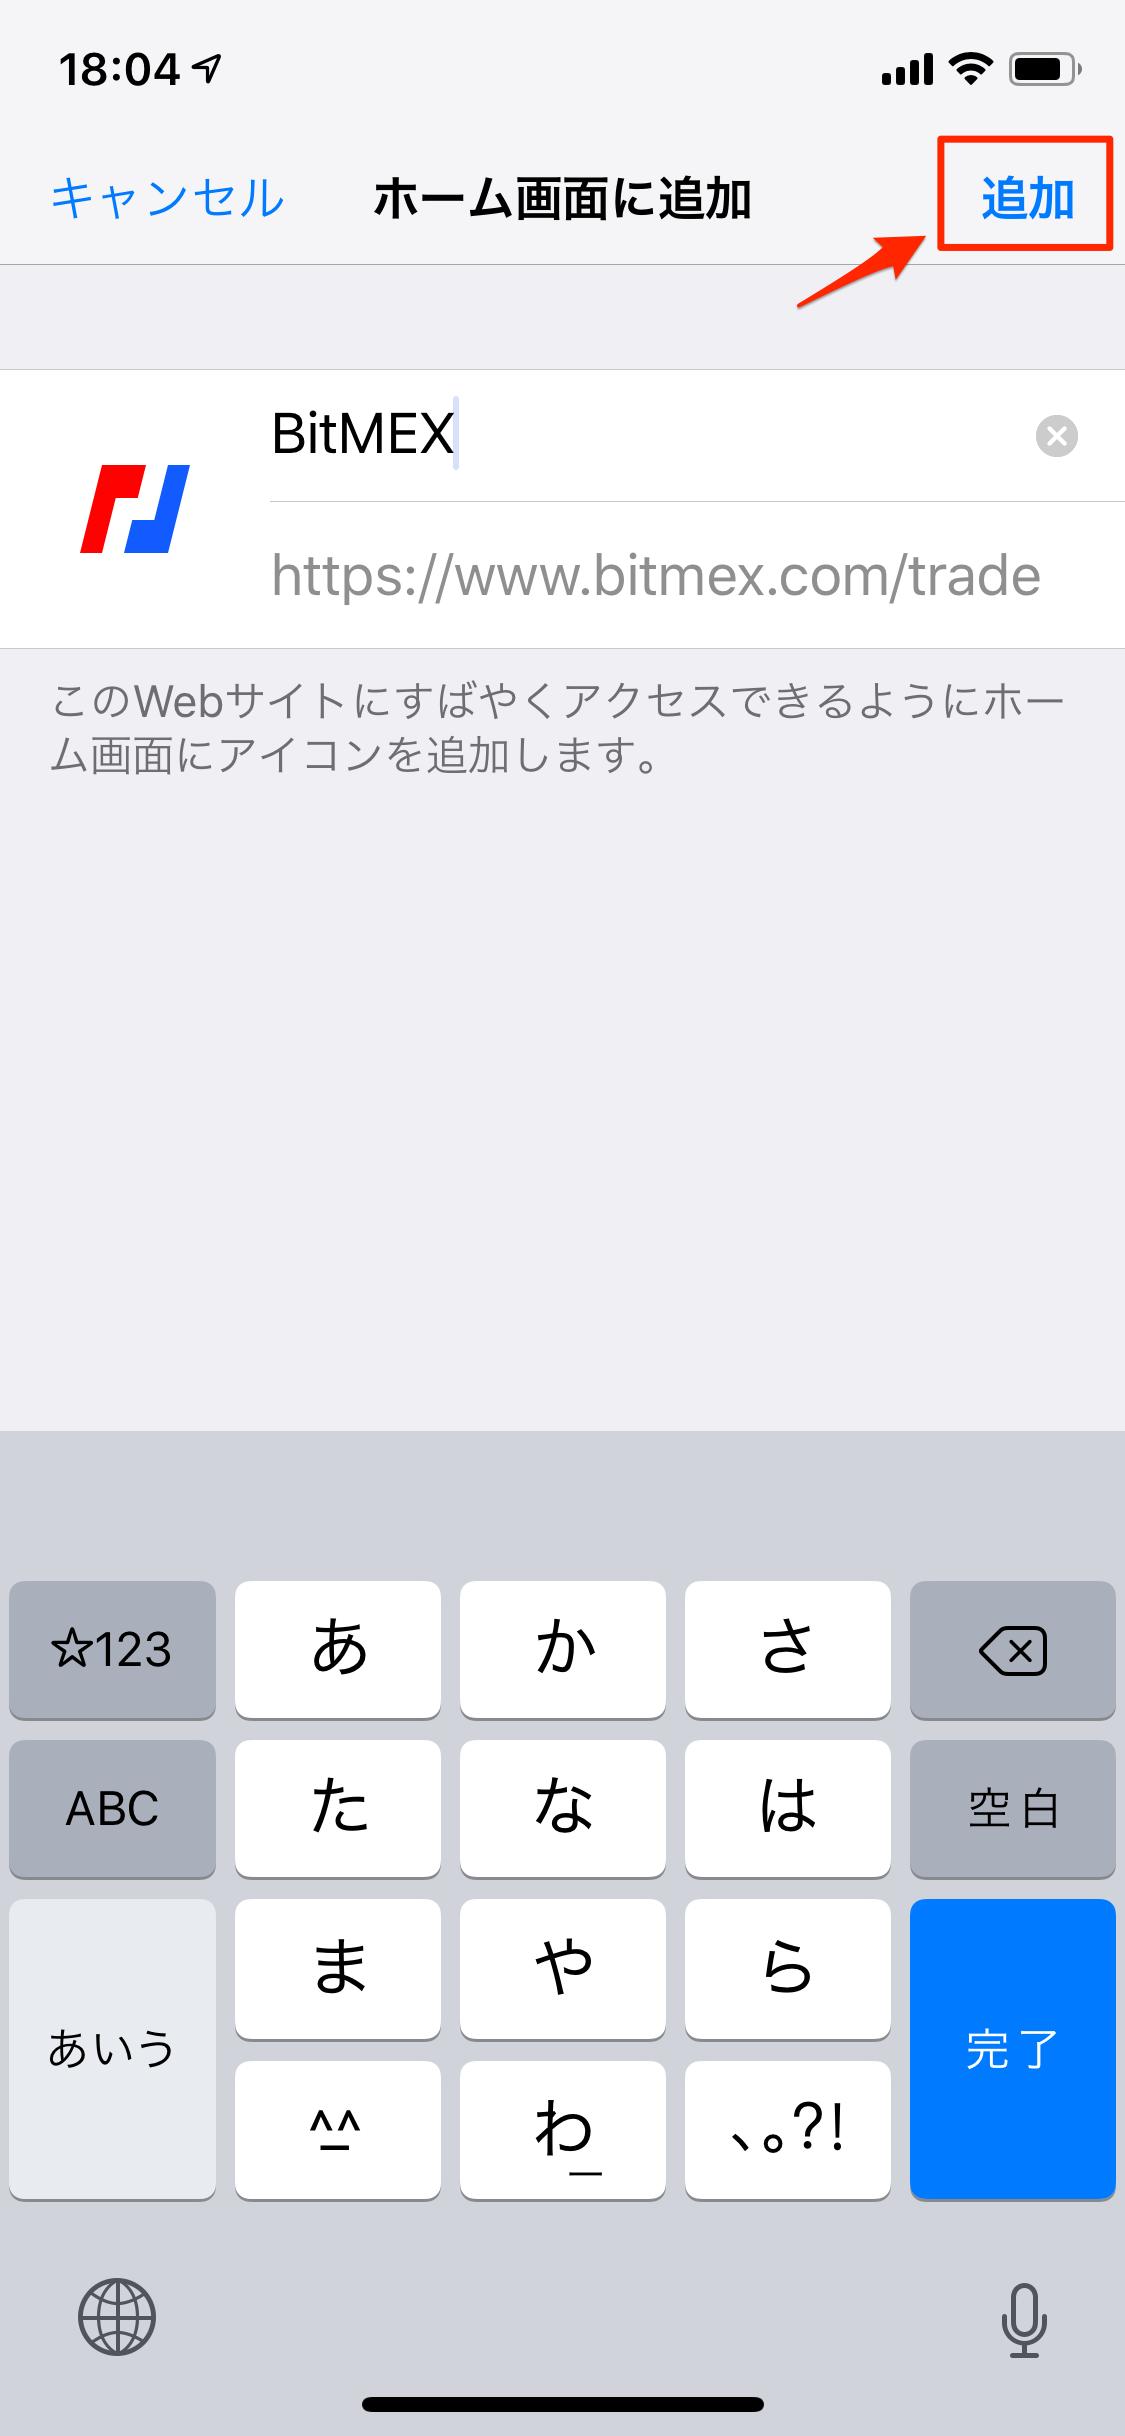 BitMEXをホーム画面に追加